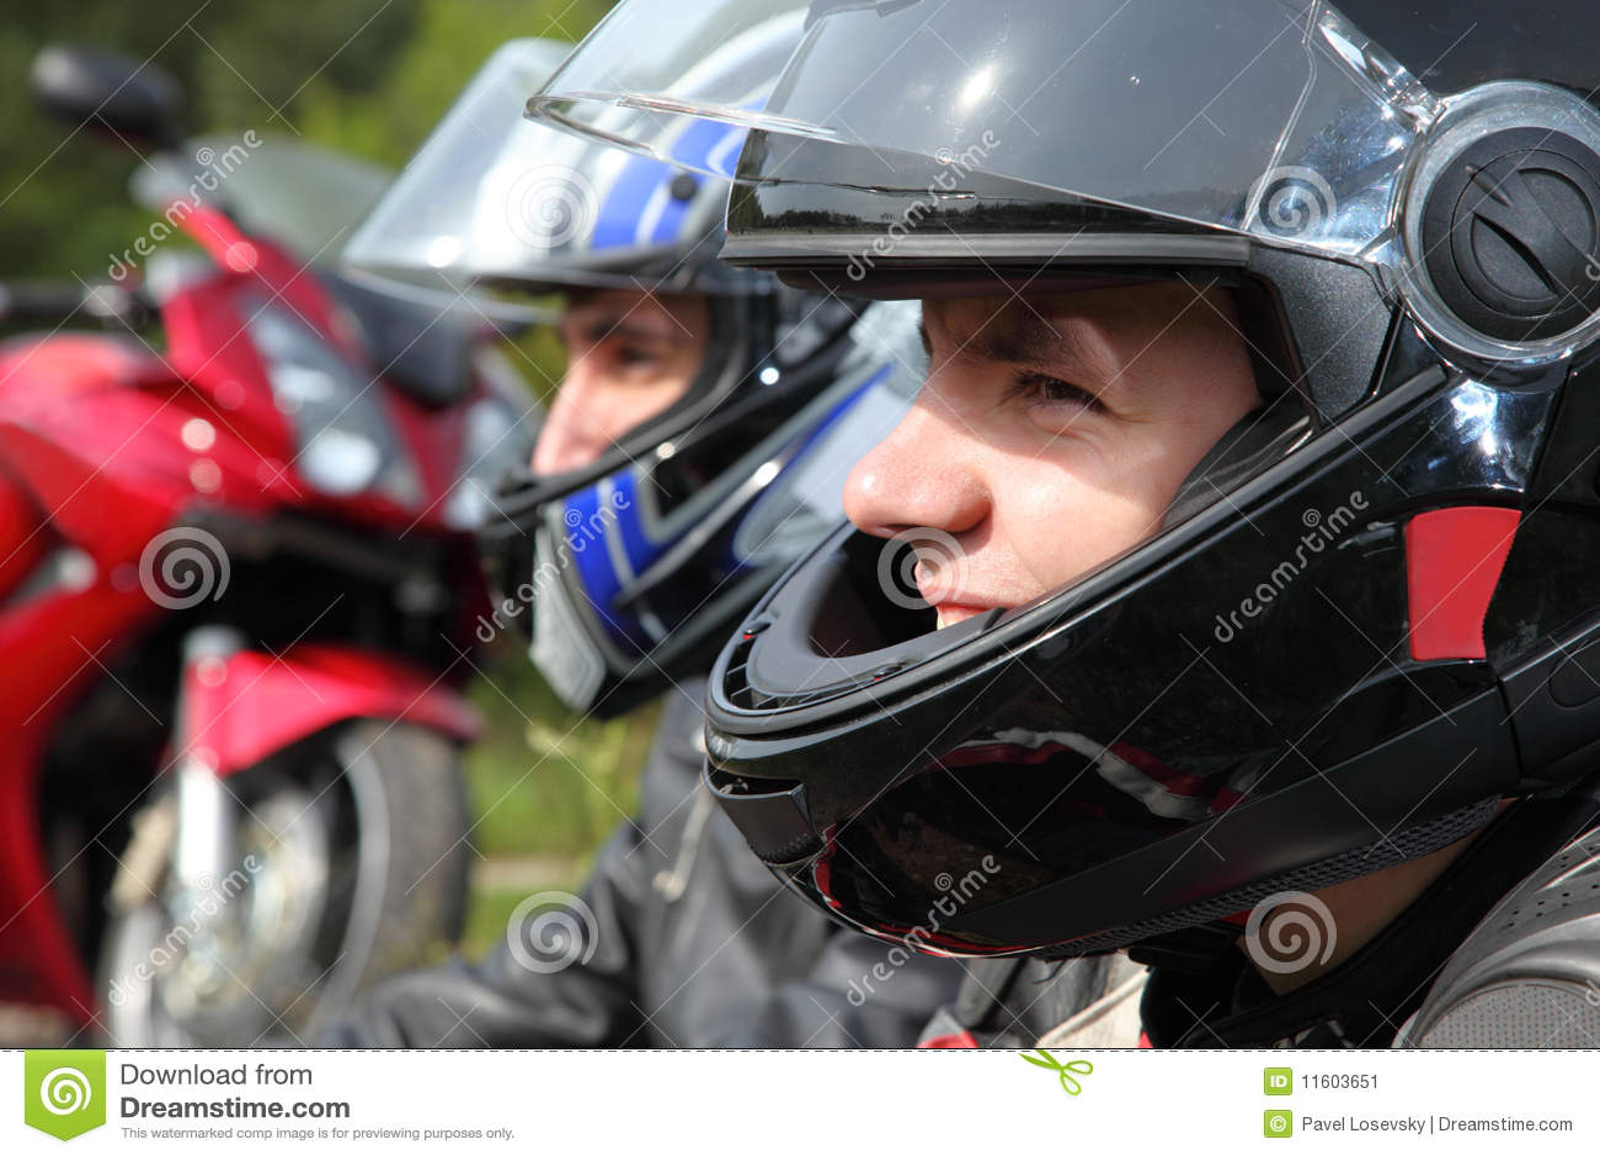 Two motorcyclists sitting near bike